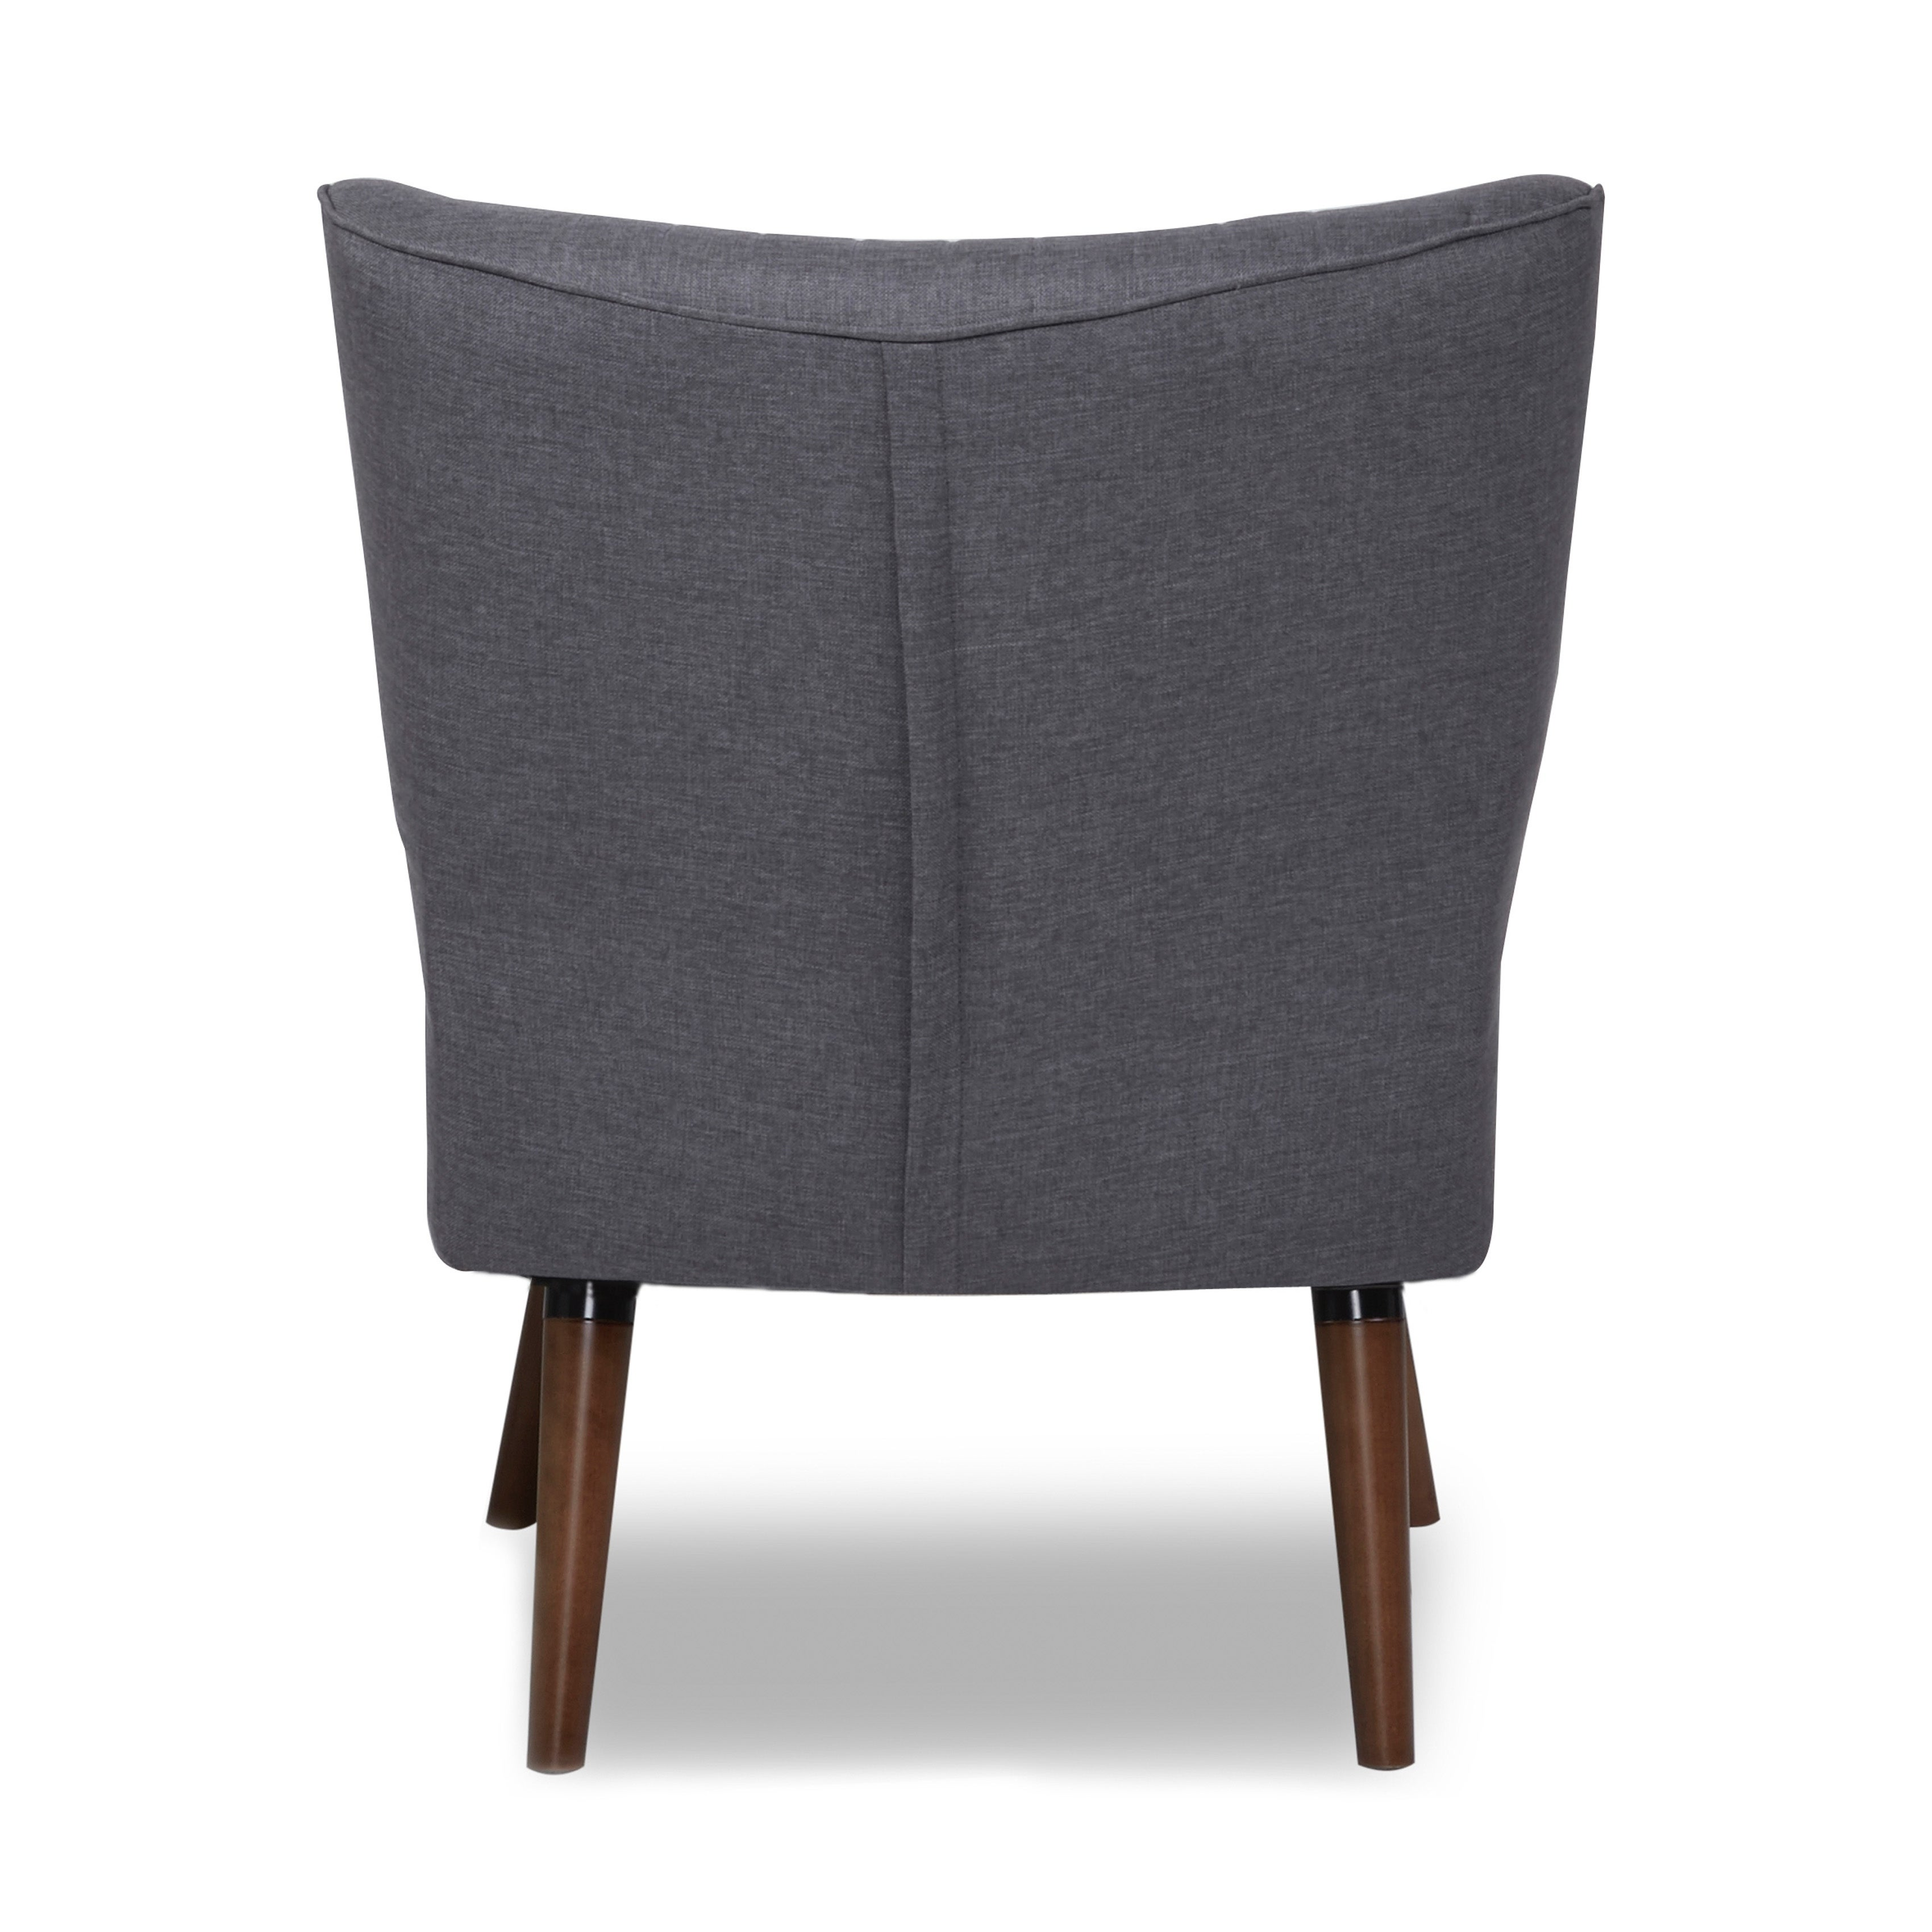 Details about Salem Dark Gray Accent Chair  sc 1 st  eBay & Salem Dark Gray Accent Chair 811430024265   eBay